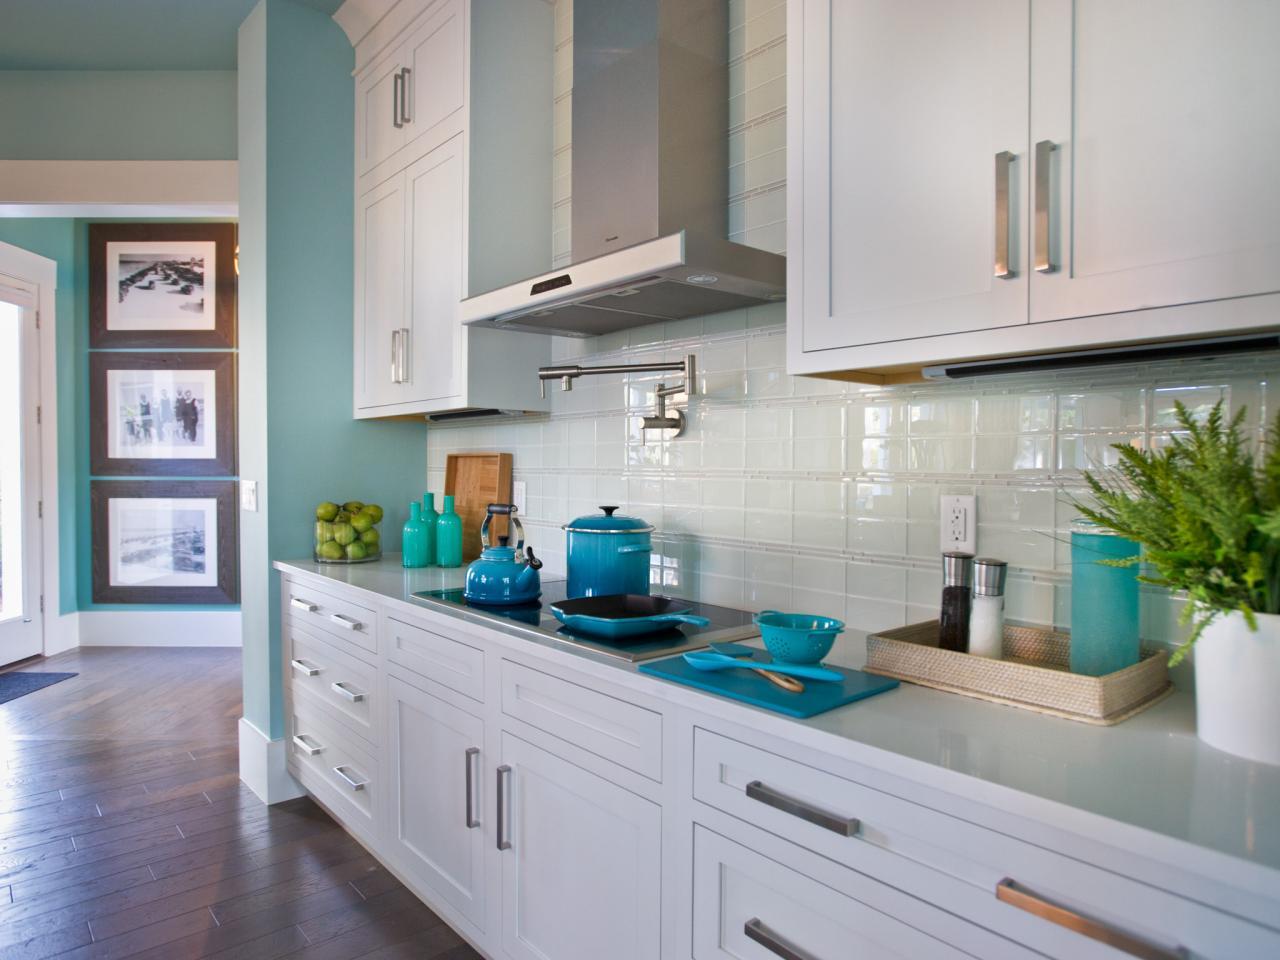 simple white kitchen cabinet systems white kitchen countertop kitchen backsplash design gallery feel home